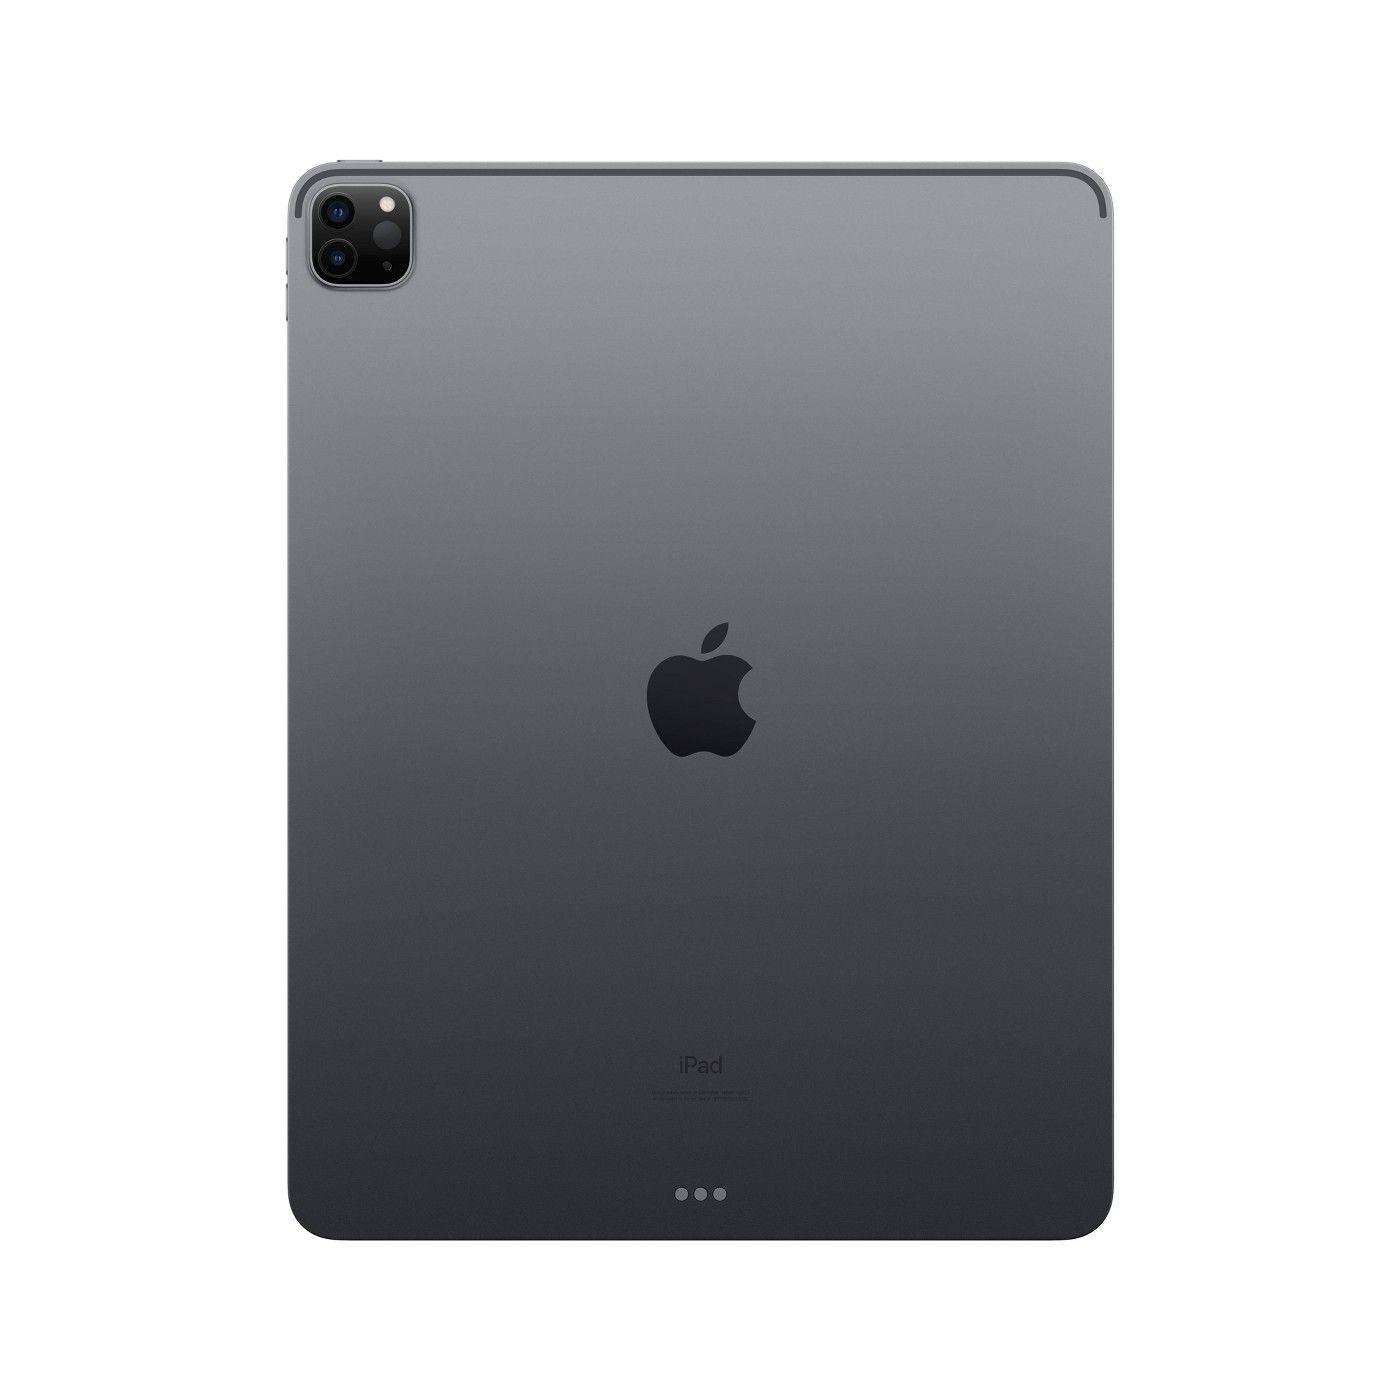 Apple Ipad Pro 11 Inch Wi Fi Only 2020 Model In 2021 Ipad Pro 12 Apple Ipad Pro Ipad Pro 12 9